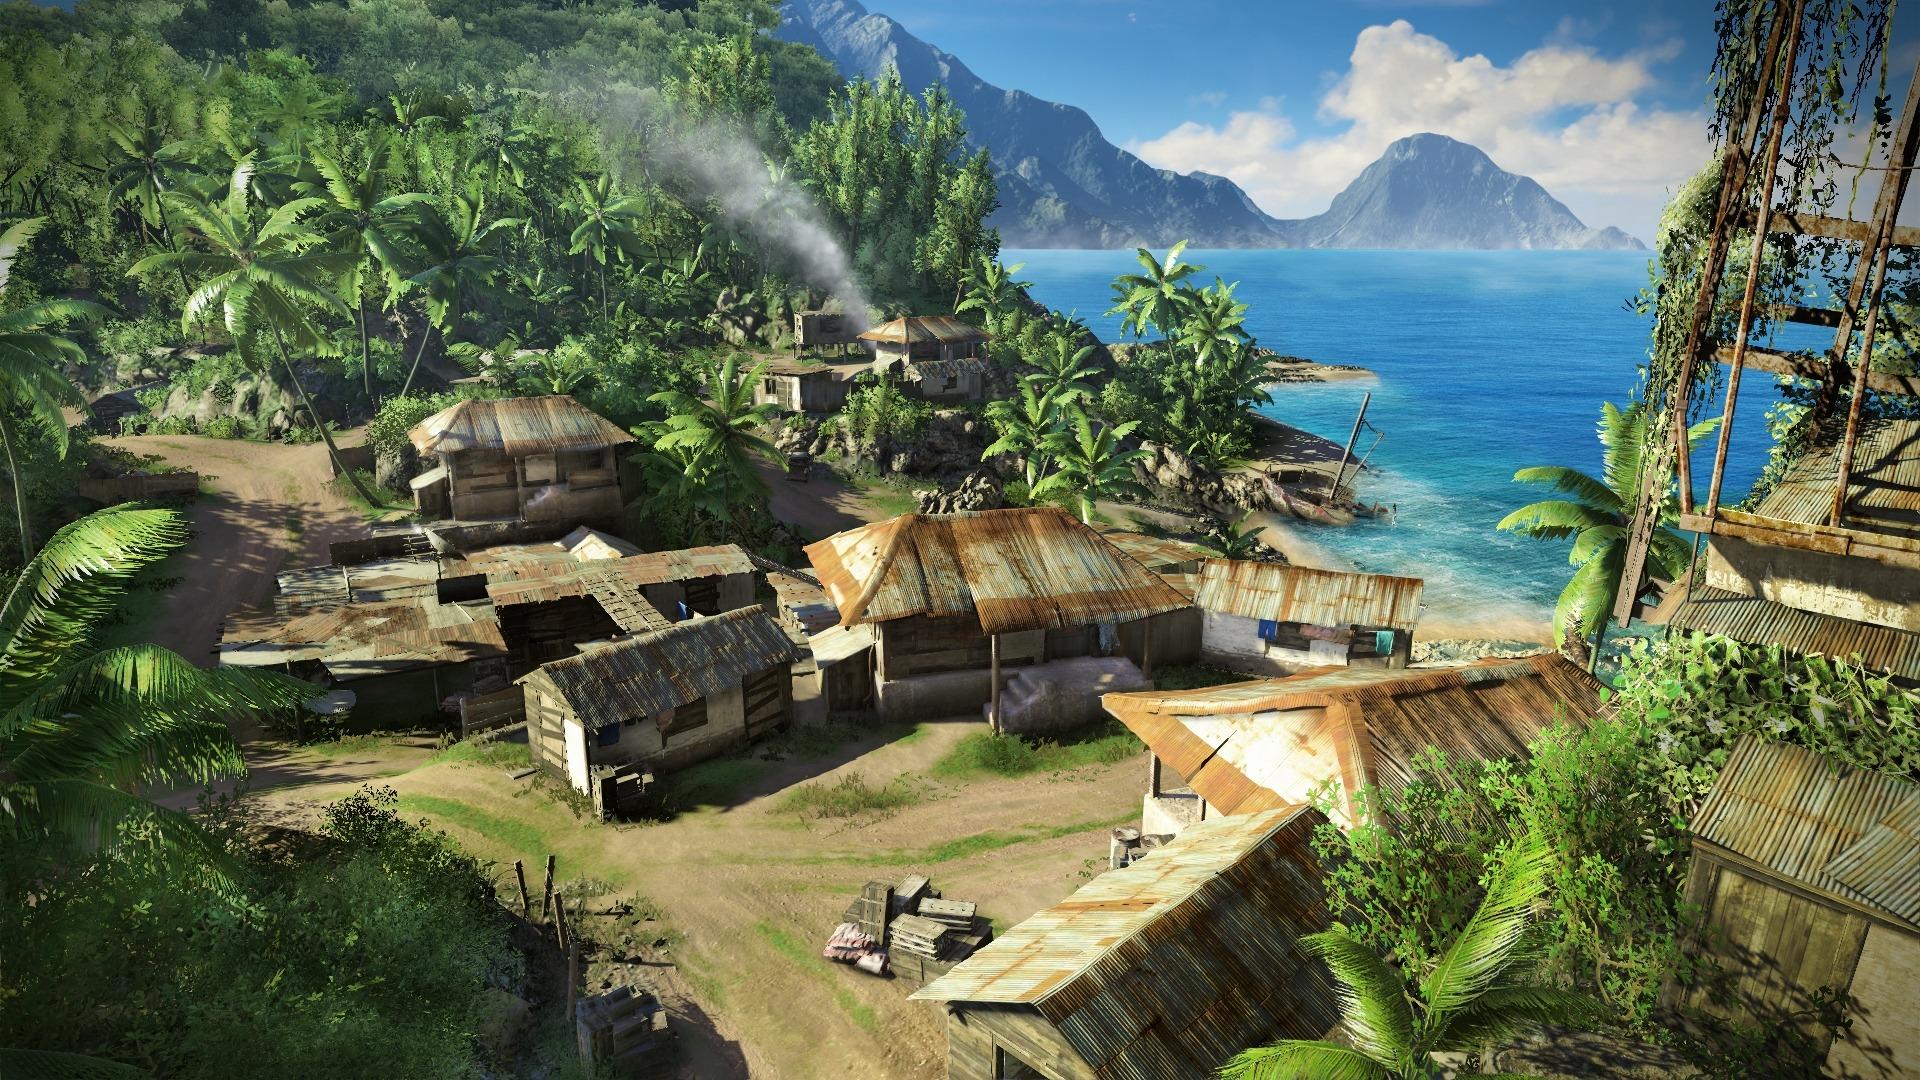 2012 Far Cry 3 Game Hd Wallpaper 46 Preview 10wallpaper Com